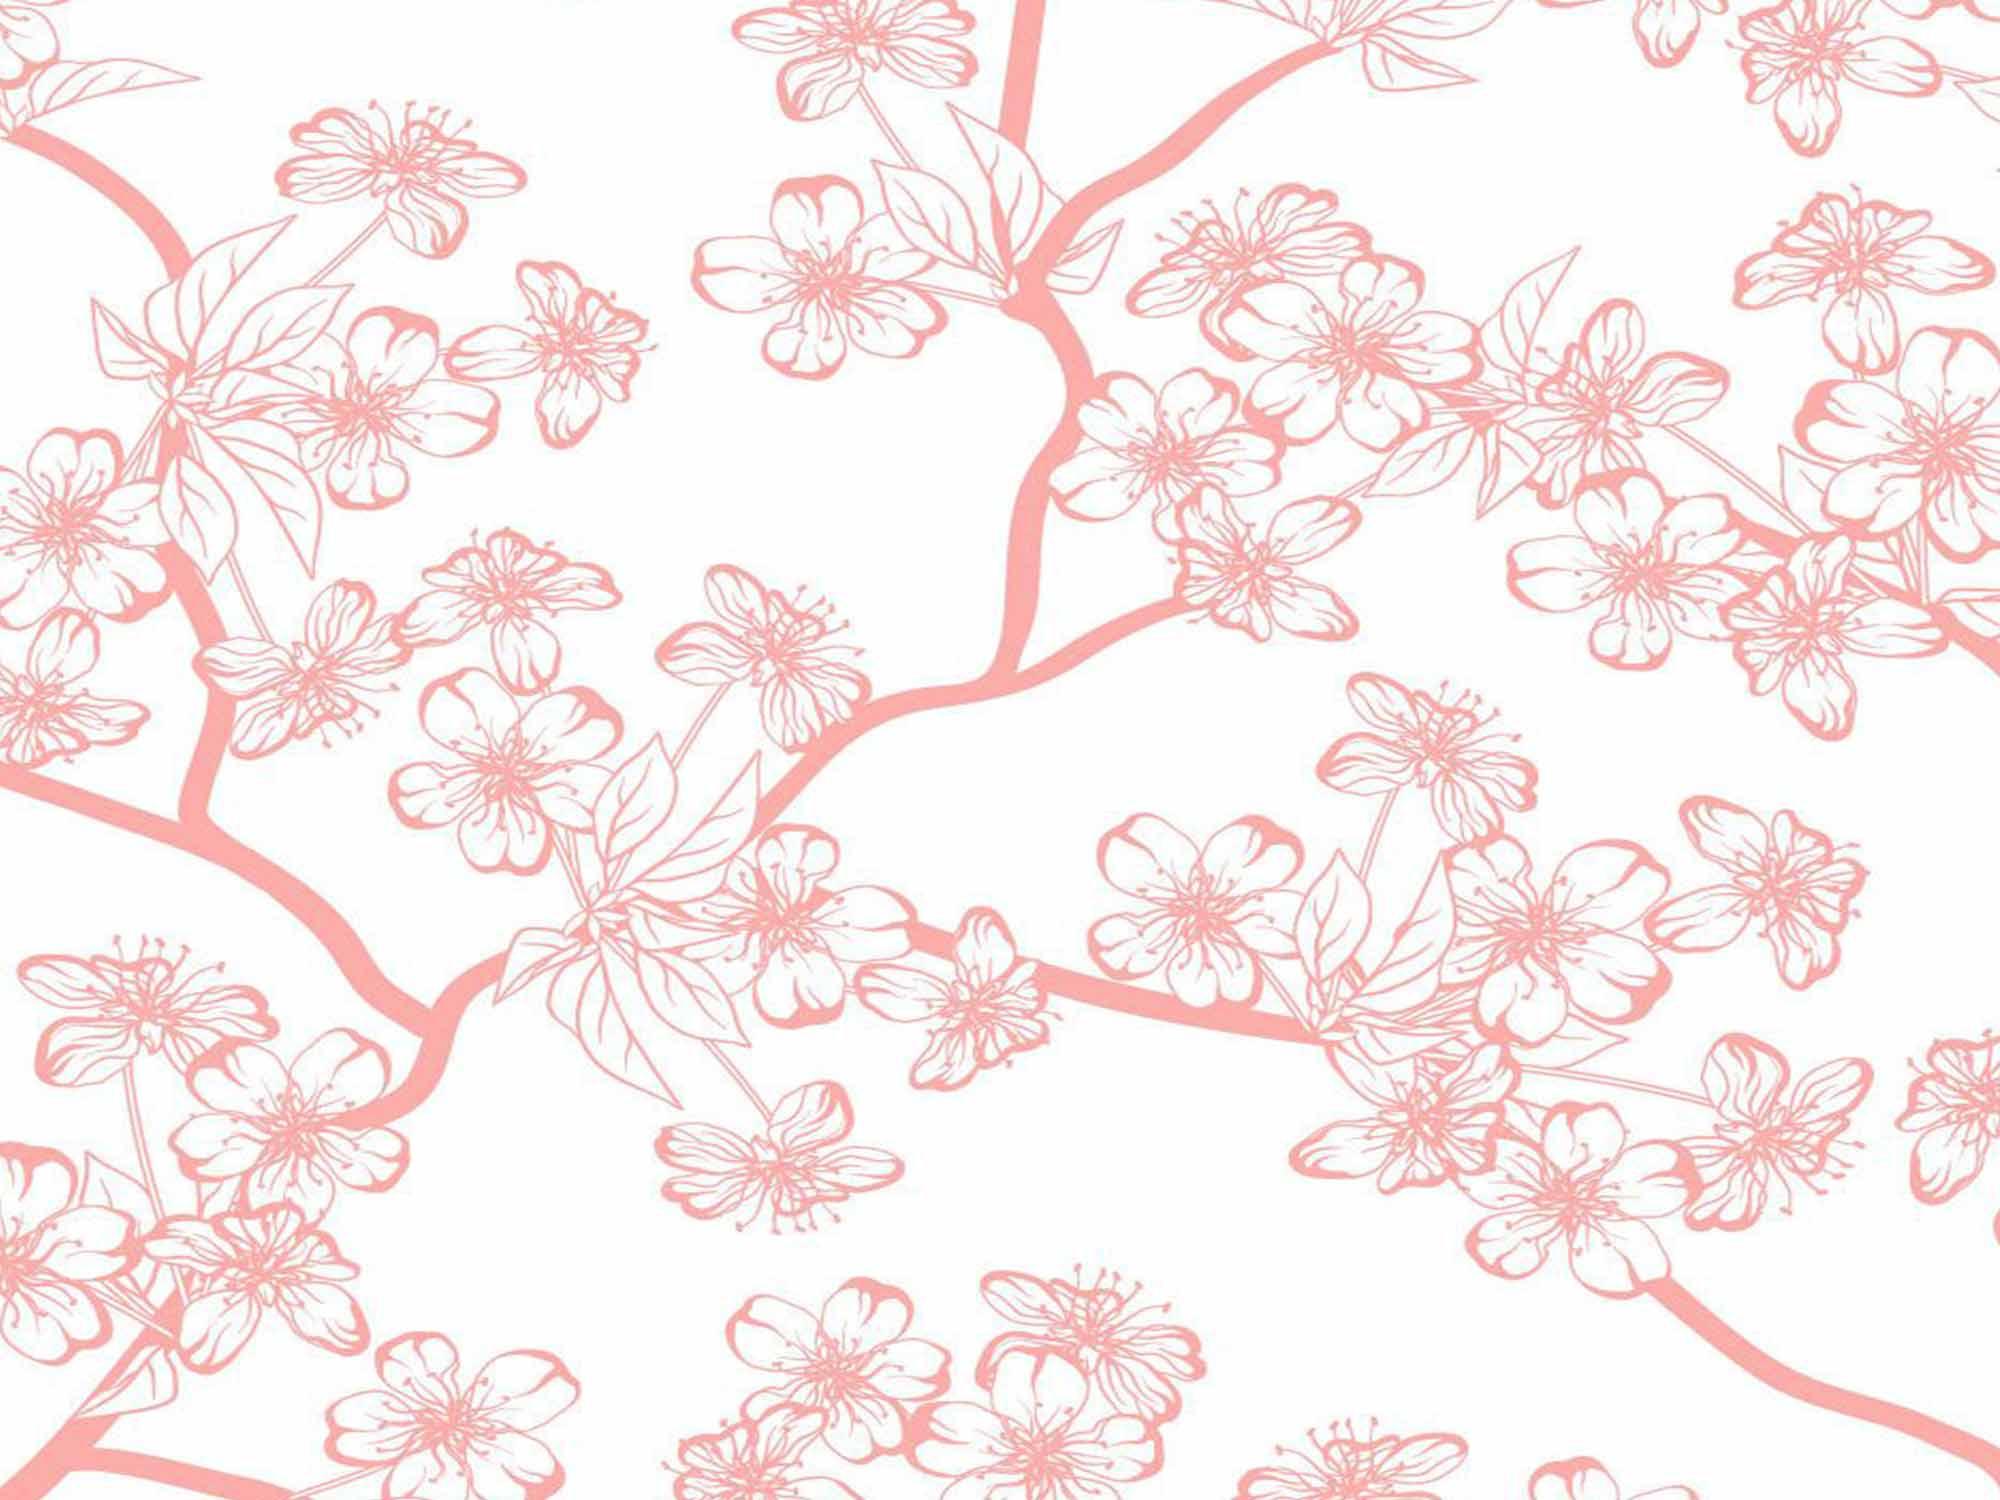 Papel de Parede Floral 0072 - Adesivos de Parede  - Paredes Decoradas